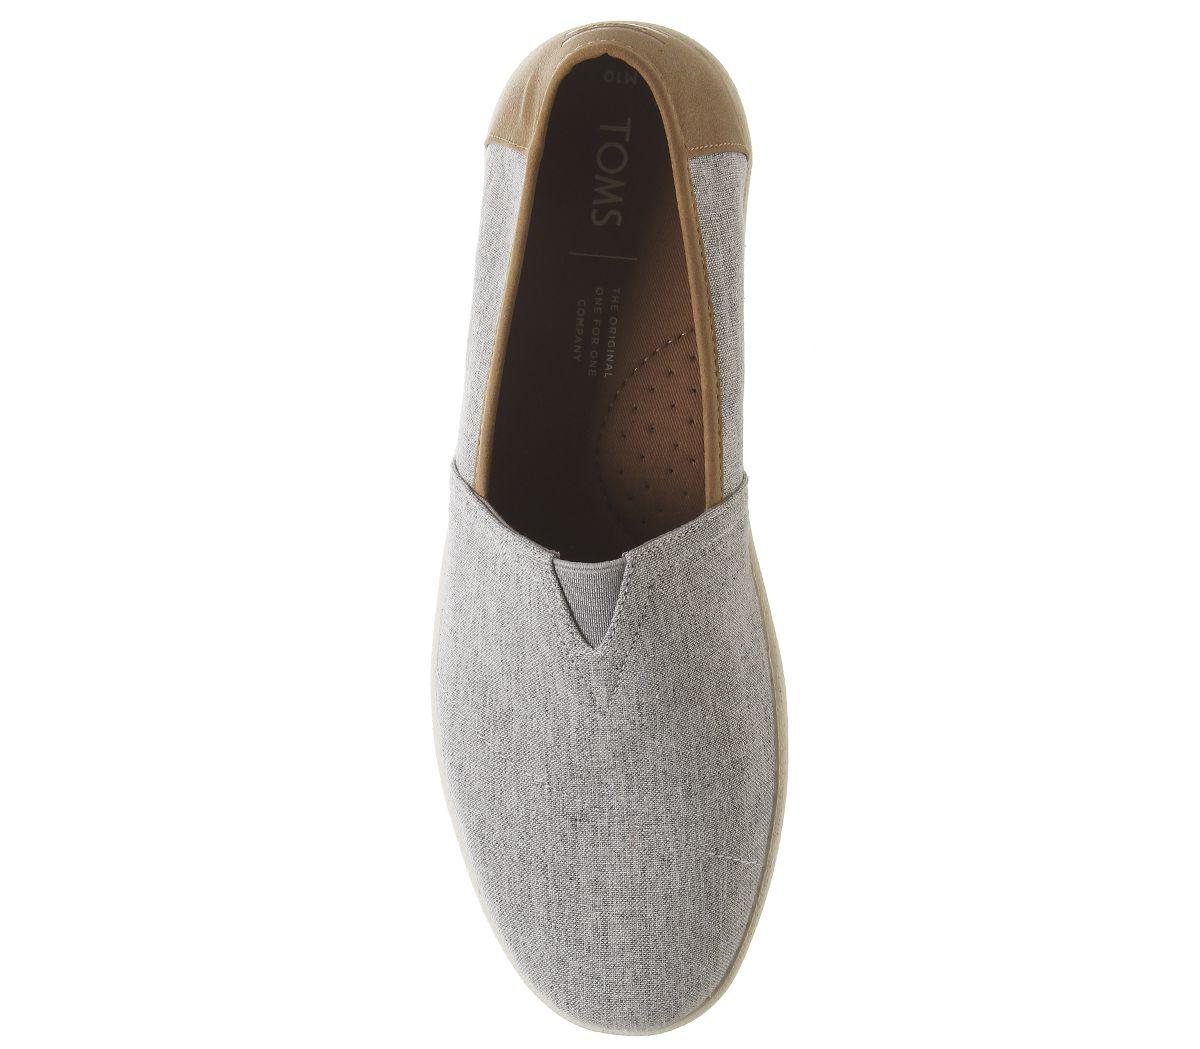 Para-Hombre-Toms-Avalon-Cupsole-Slip-Ons-llovizna-Gris-Chambray-Informal-Zapatos miniatura 5